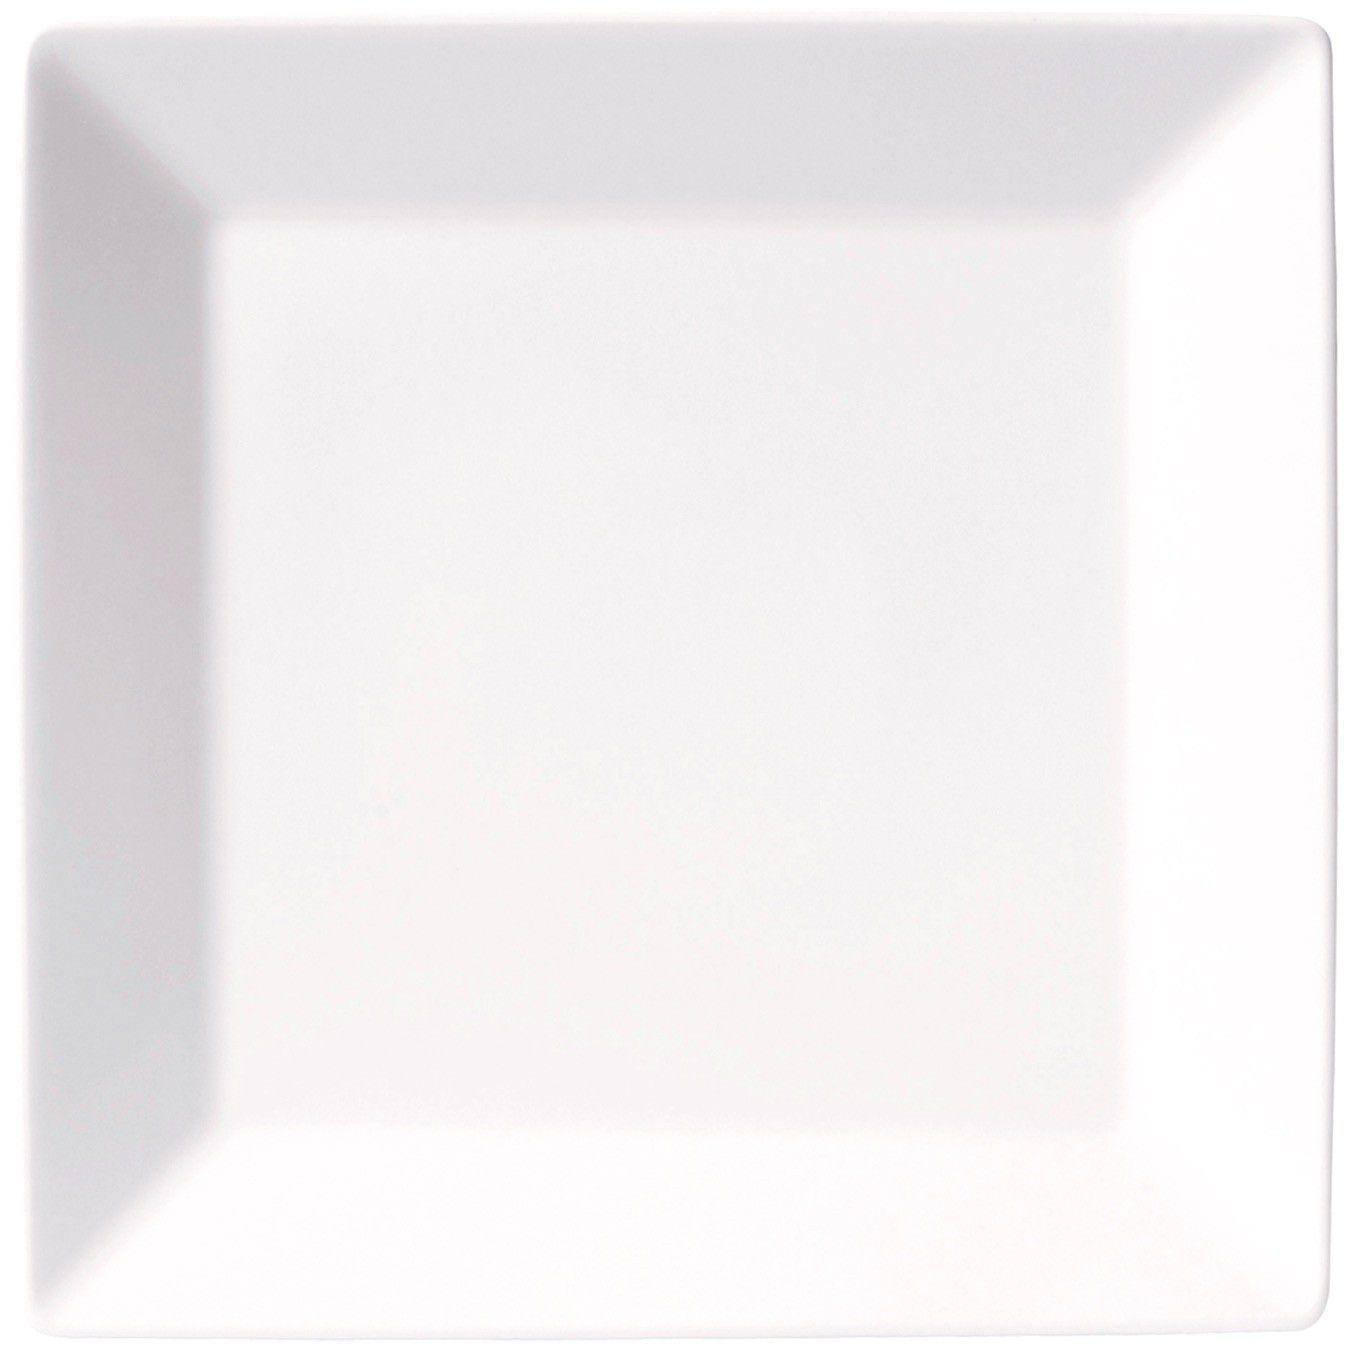 Prato De Porcelana Quartier Branco Raso Cx/12